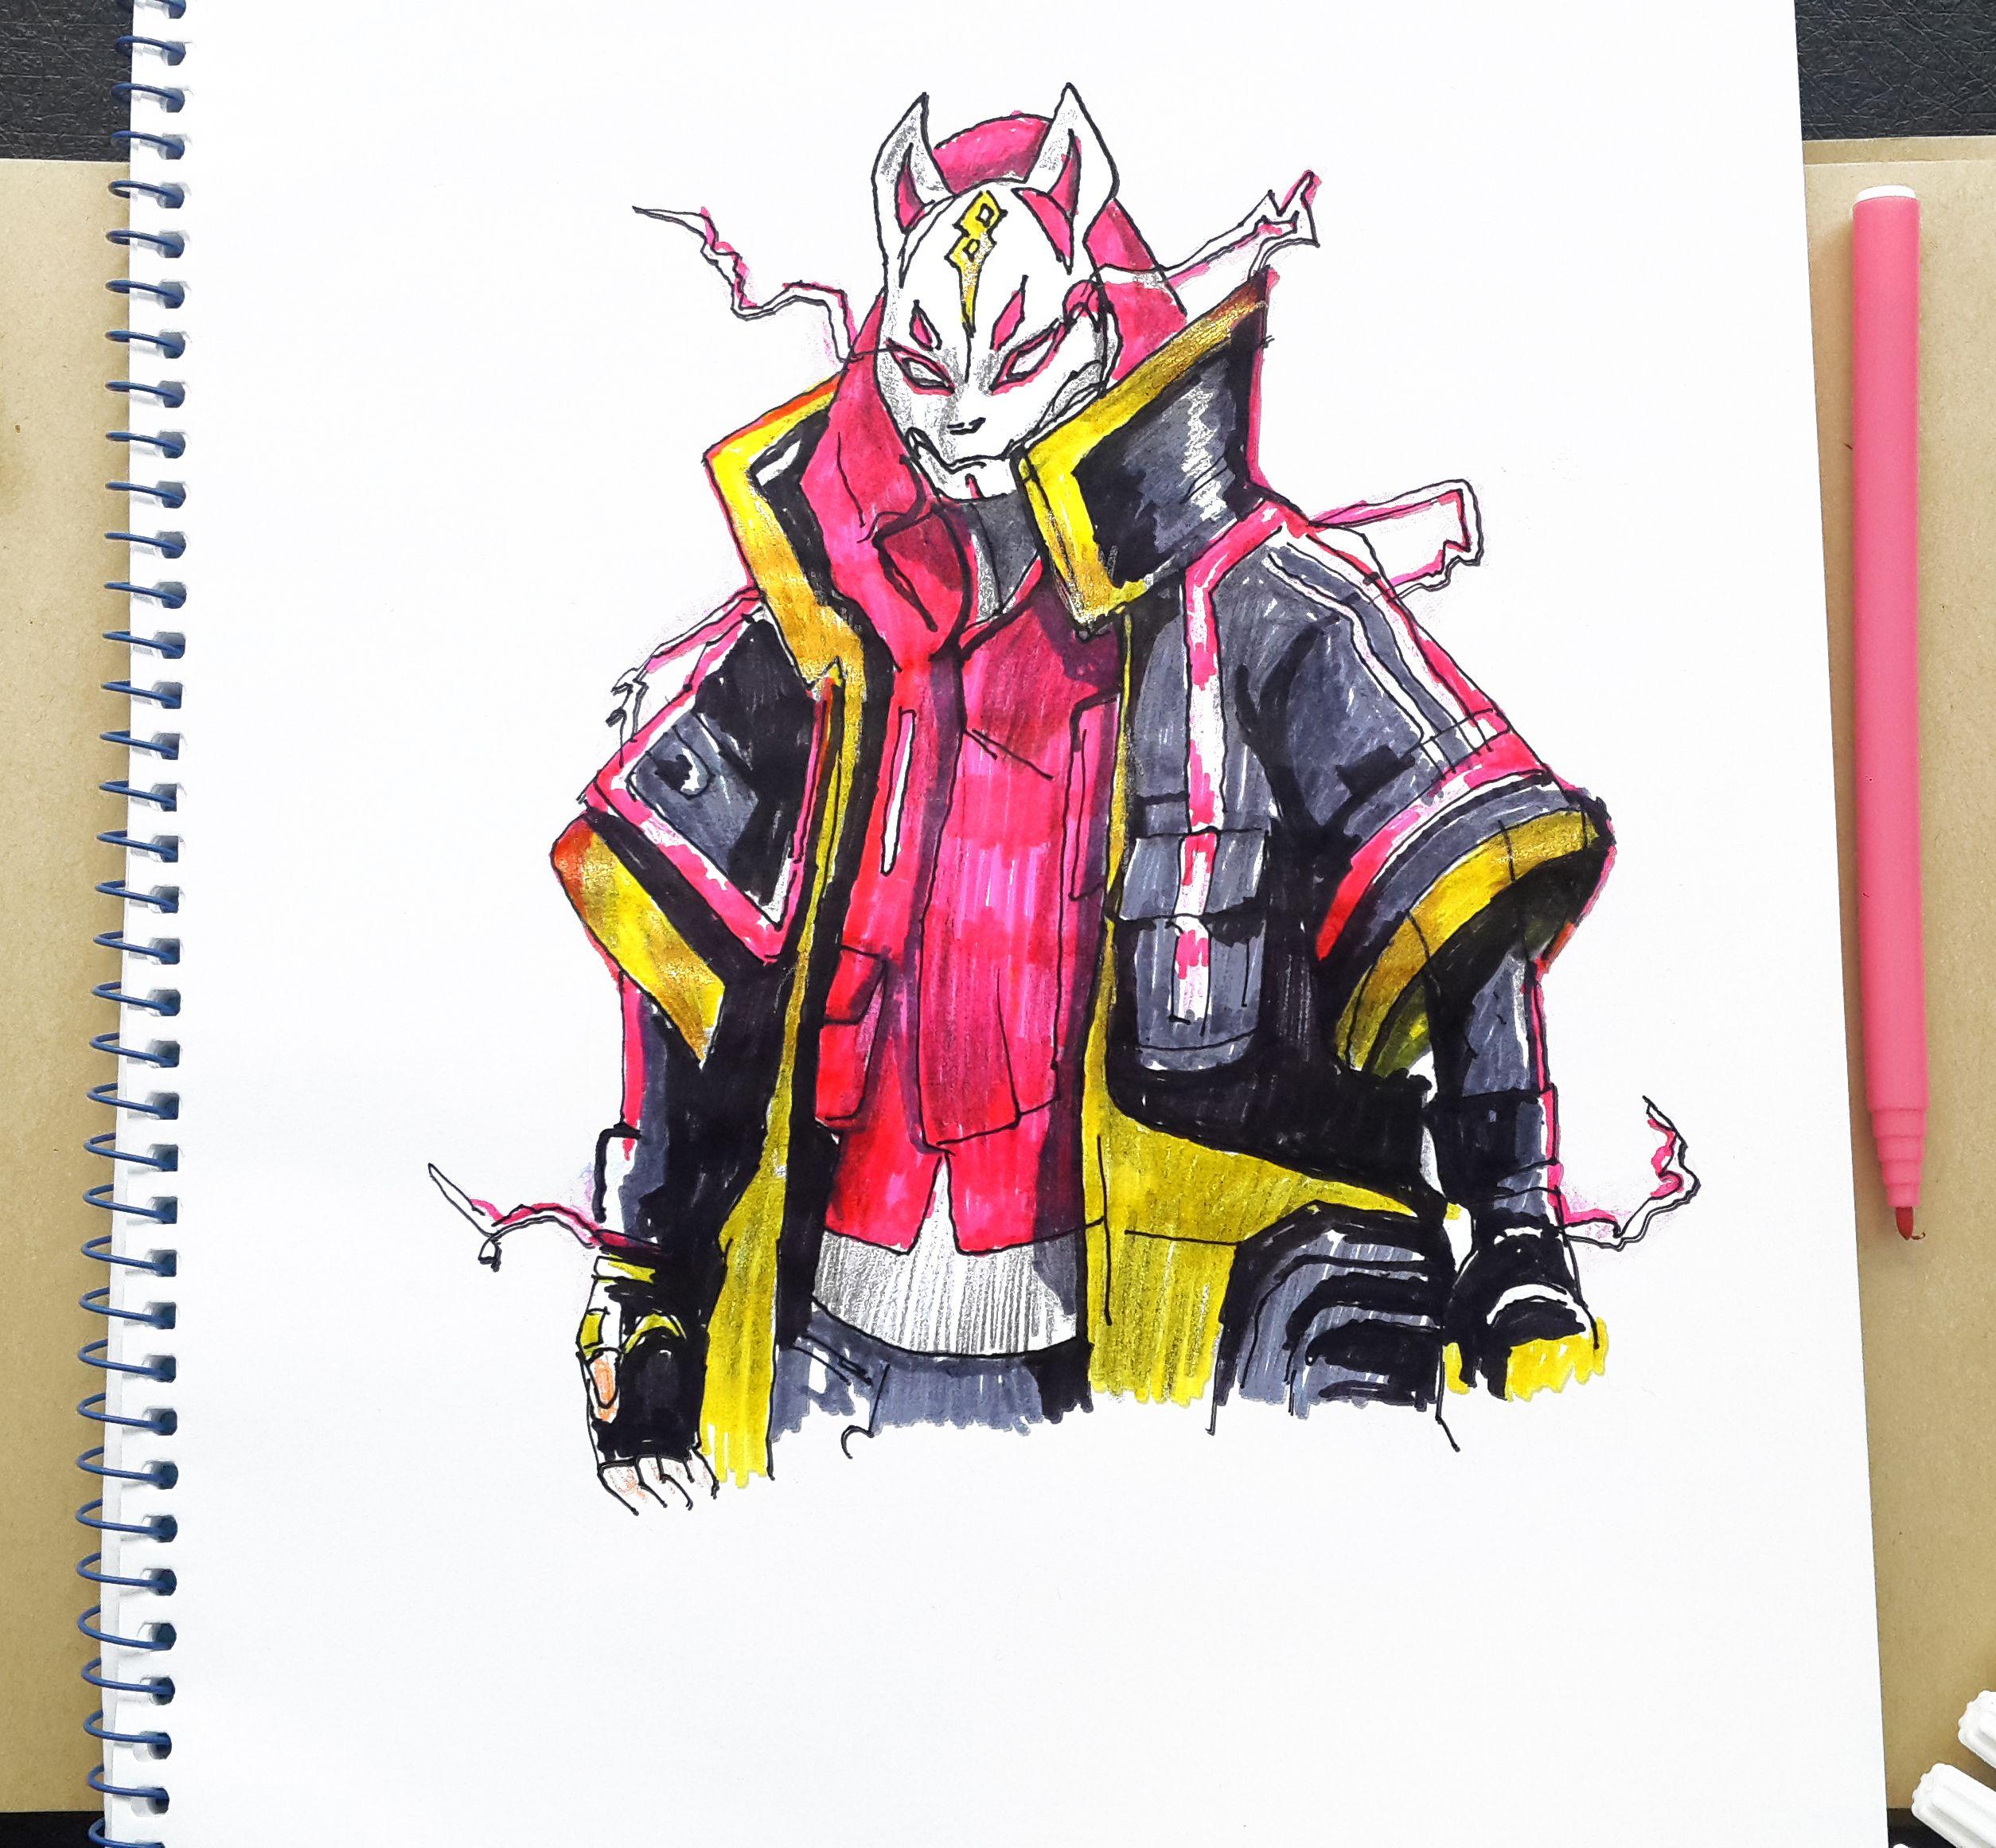 Drift Fortnite Max Level Fortnite Character How To Draw Art